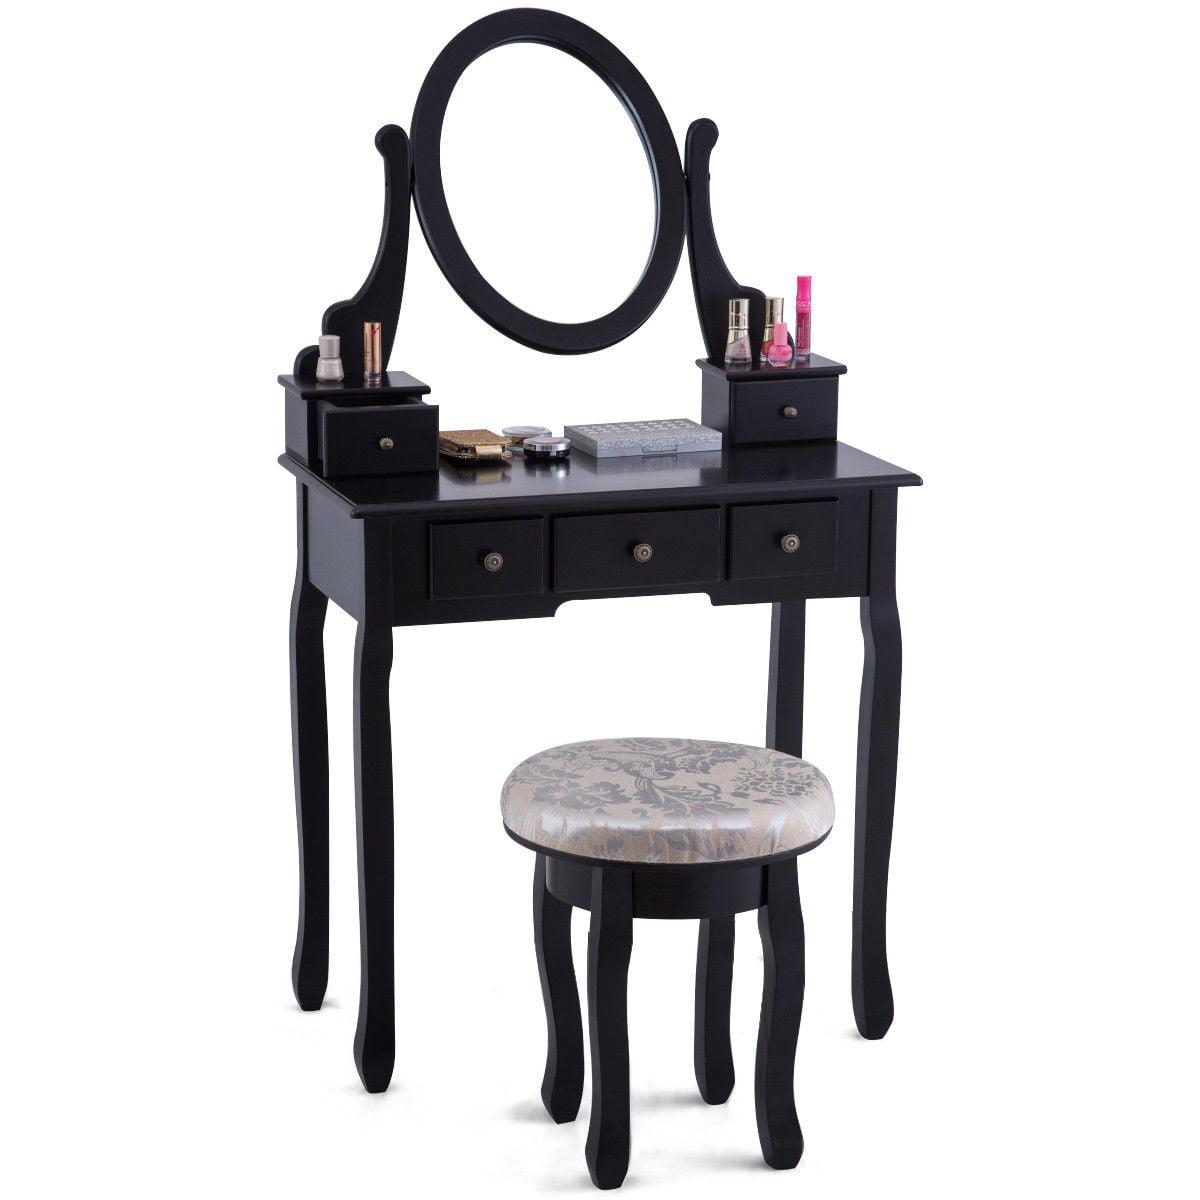 Costway Vanity Table Set Makeup Table Cushioned Stool Mirror 5 Drawers Black